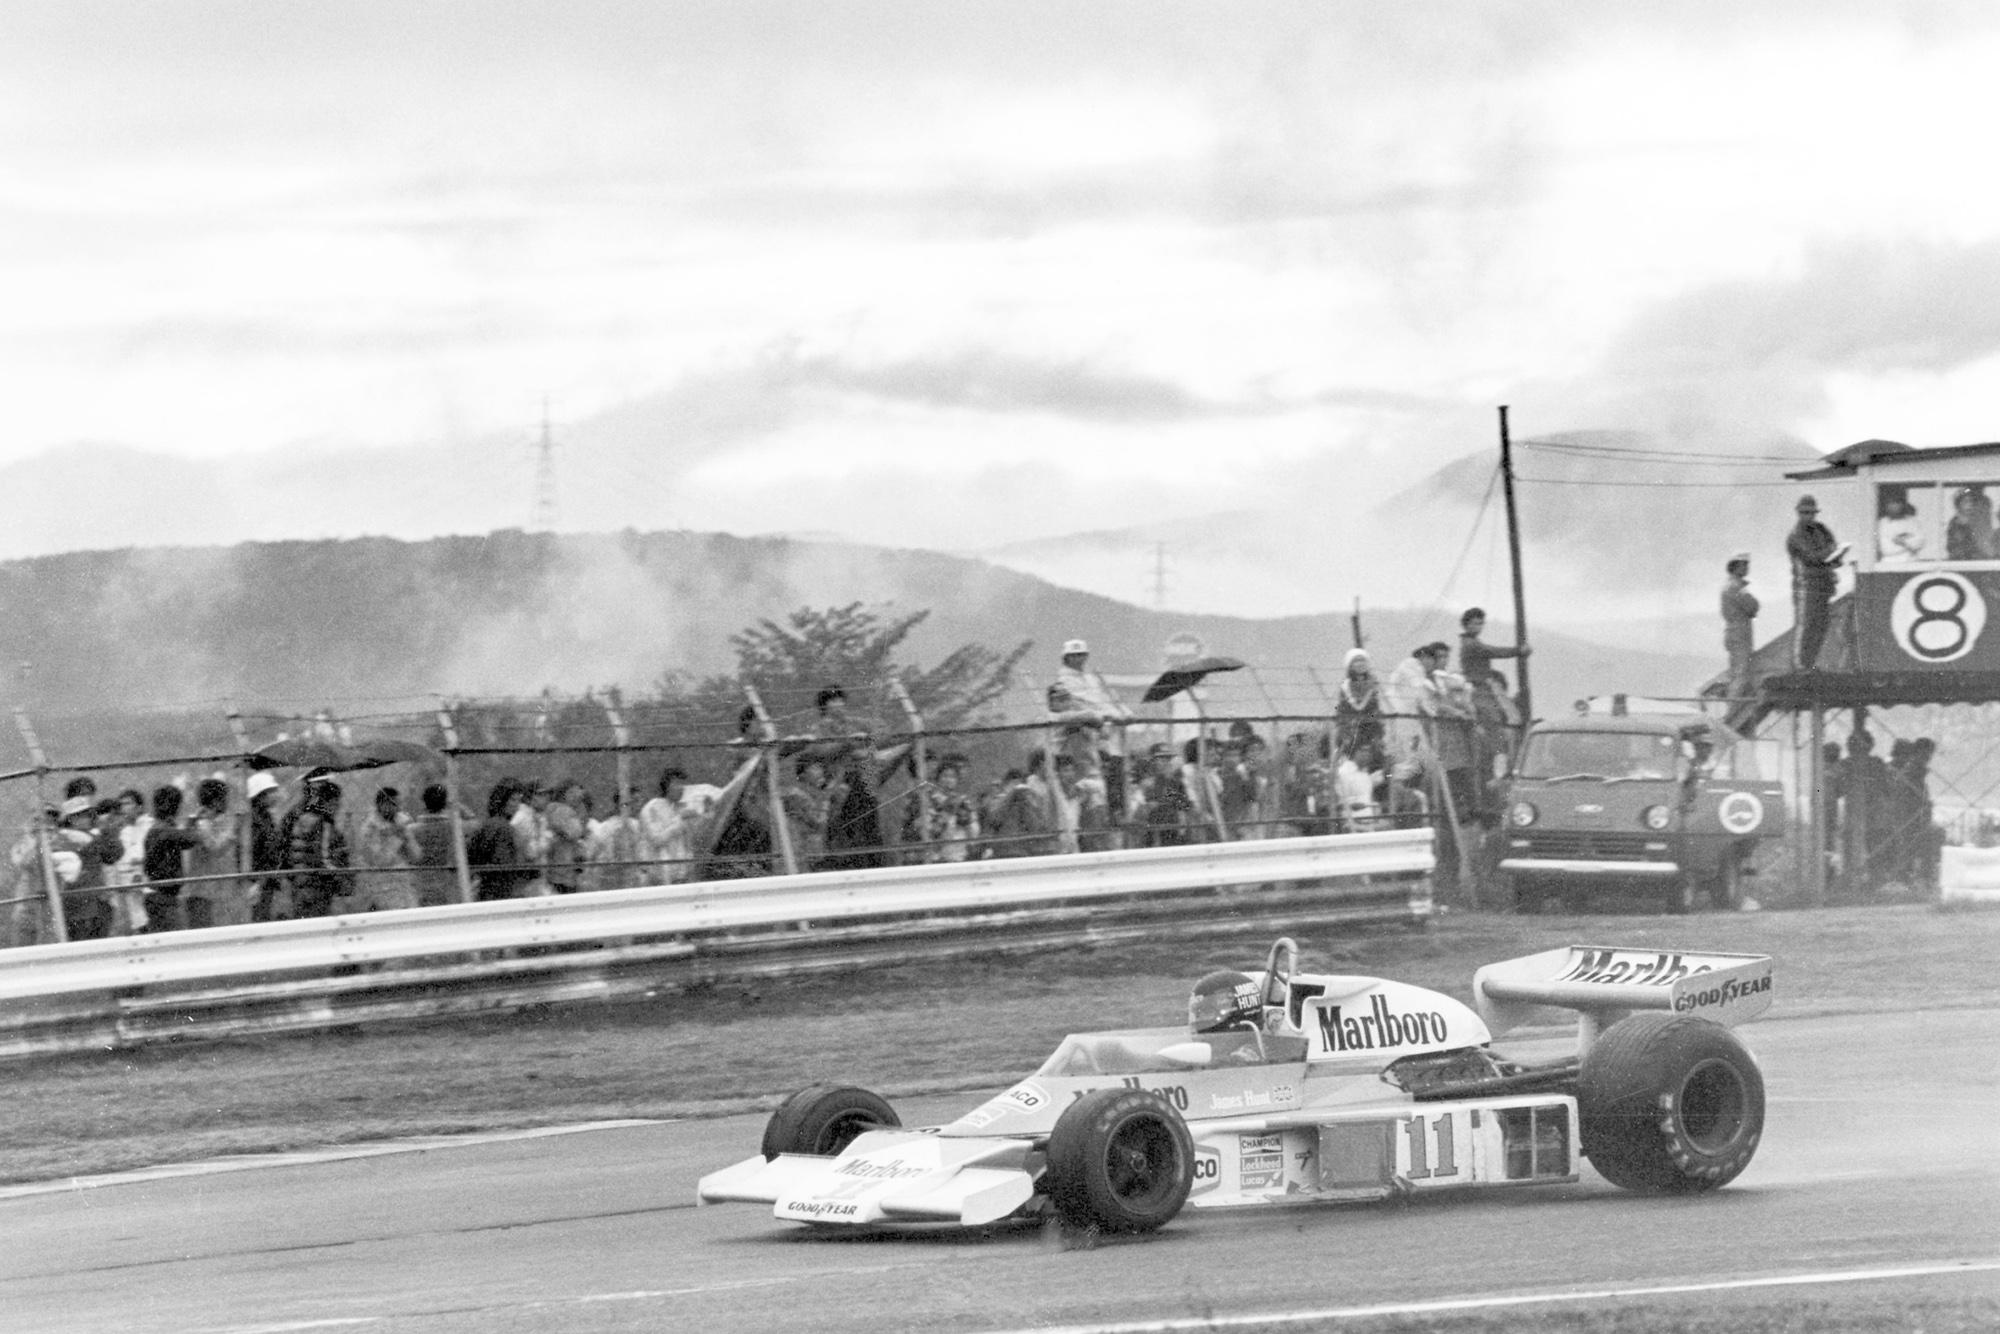 James Hunt at the 1976 Japanese Grand Prix in Fuji